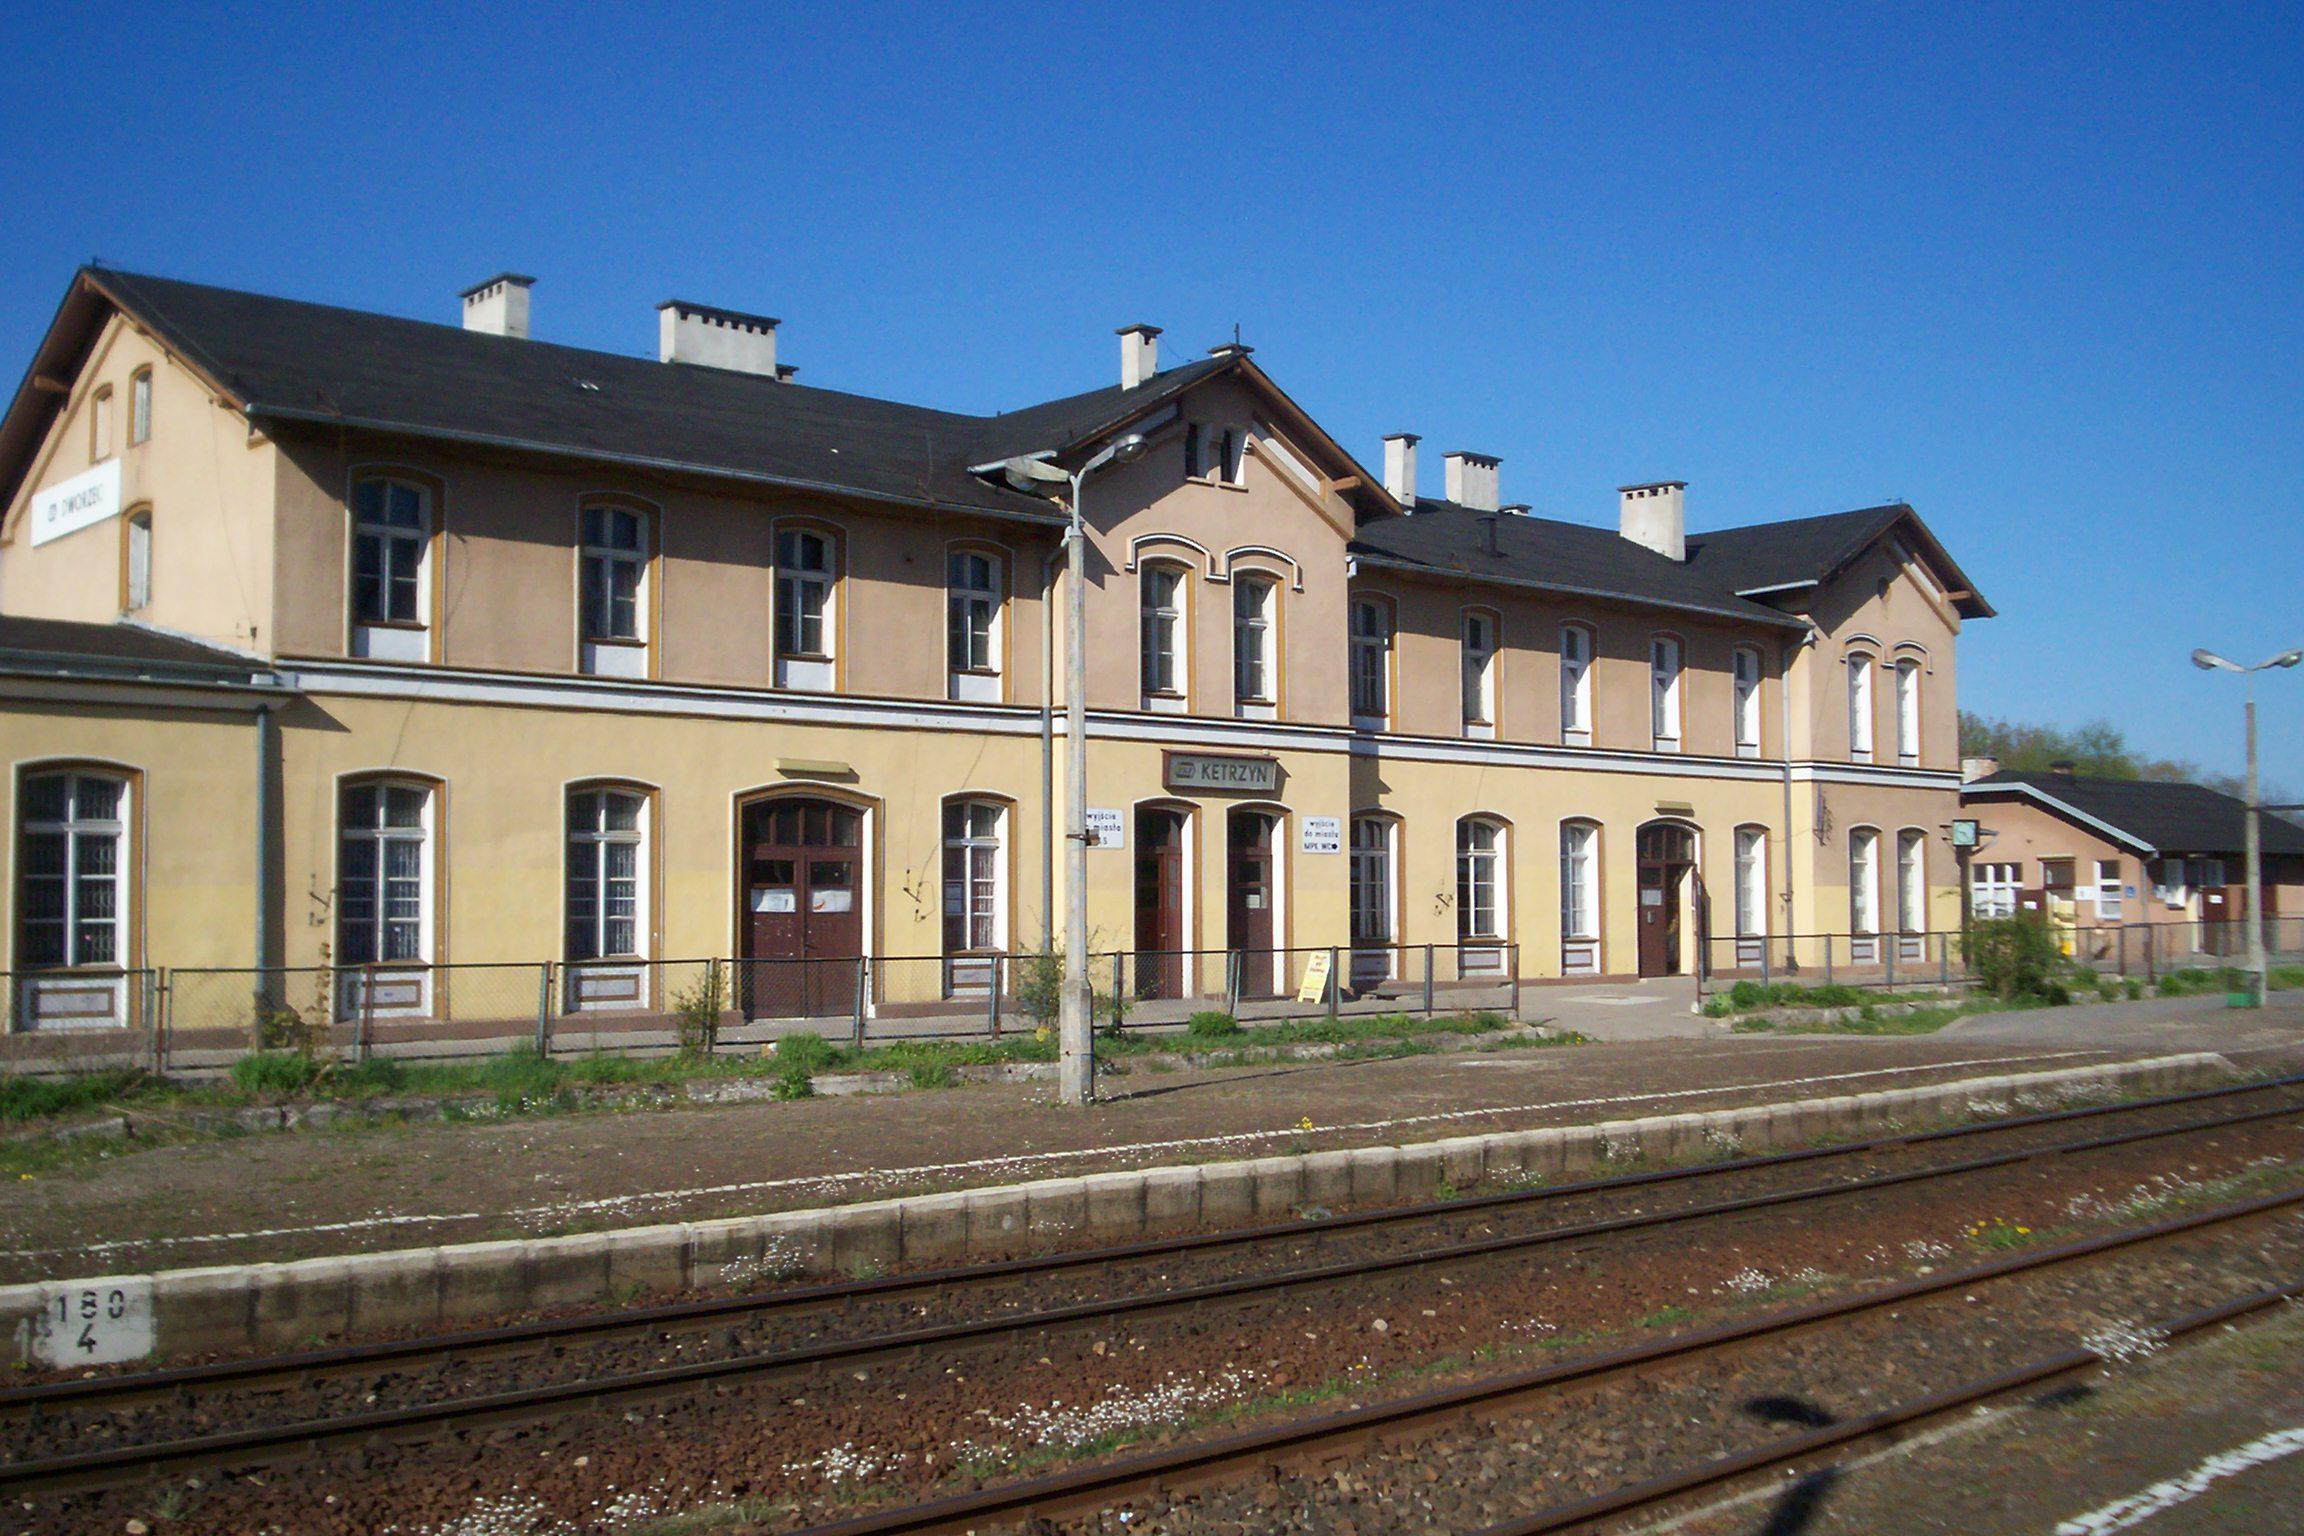 Station Kętrzyn